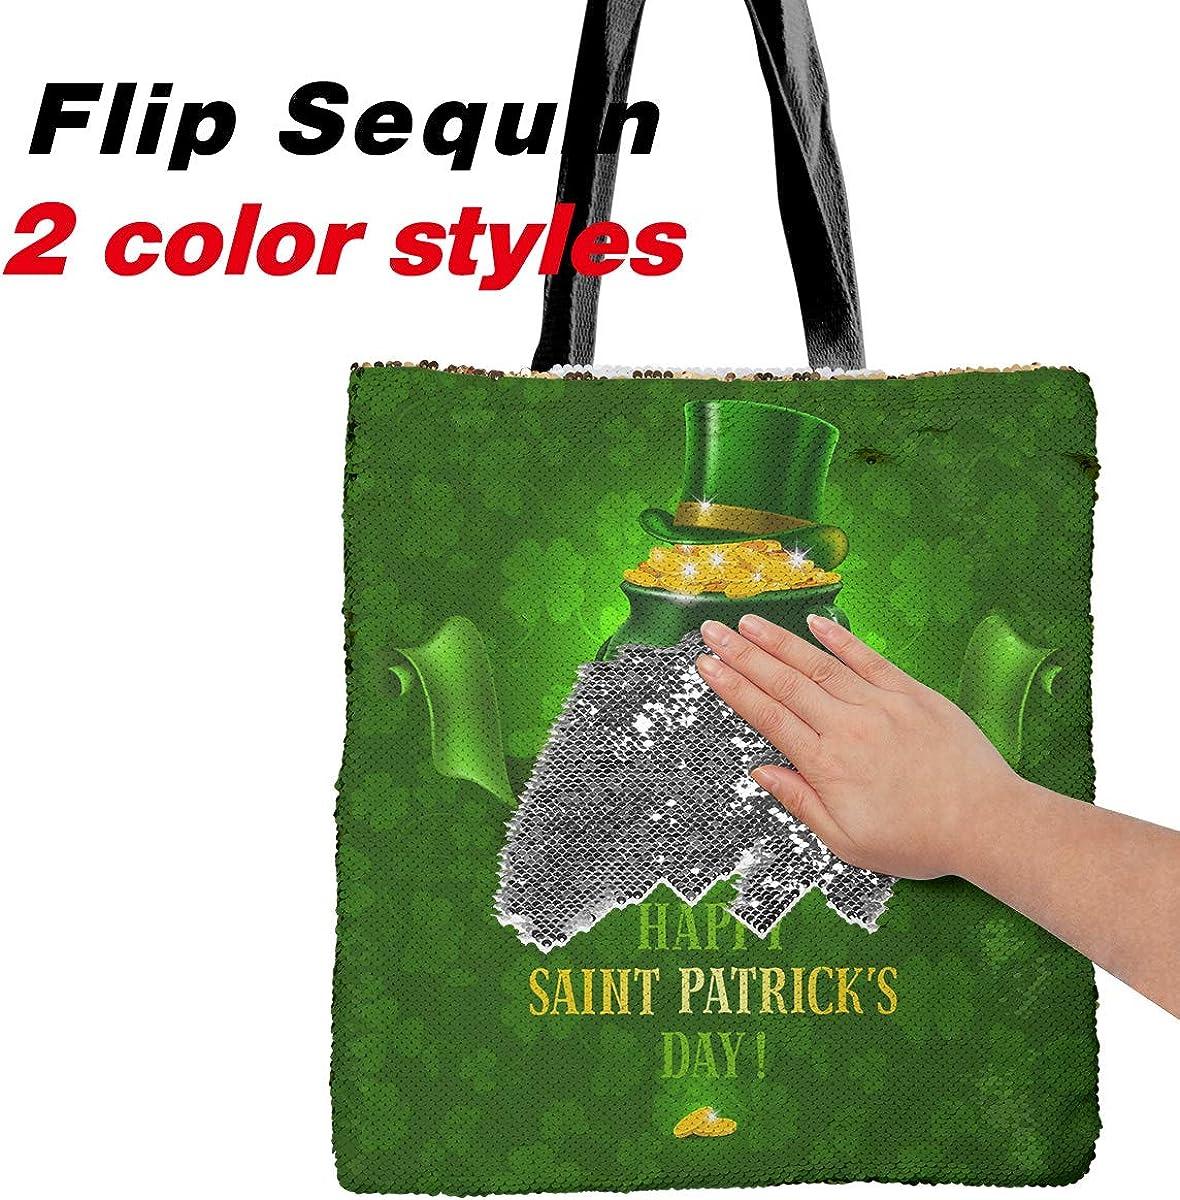 Tote Bag Sequin Tote Sequin Accessory Flip Sequins Custom Tote Bag Sequin Bag Personalized Sequin Reversible Sequins